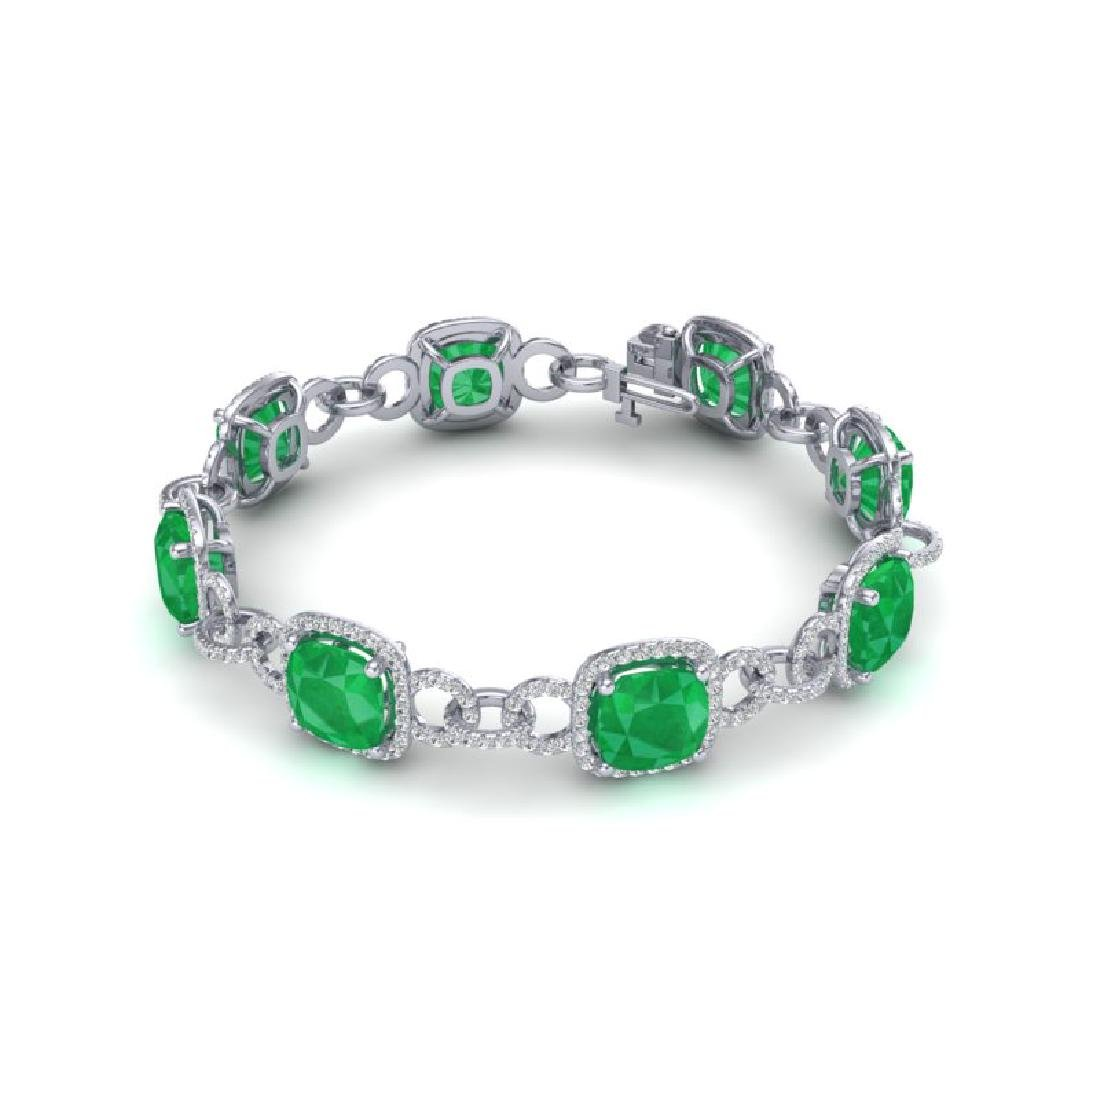 25 CTW Emerald & VS/SI Diamond Bracelet 14K White Gold - 2